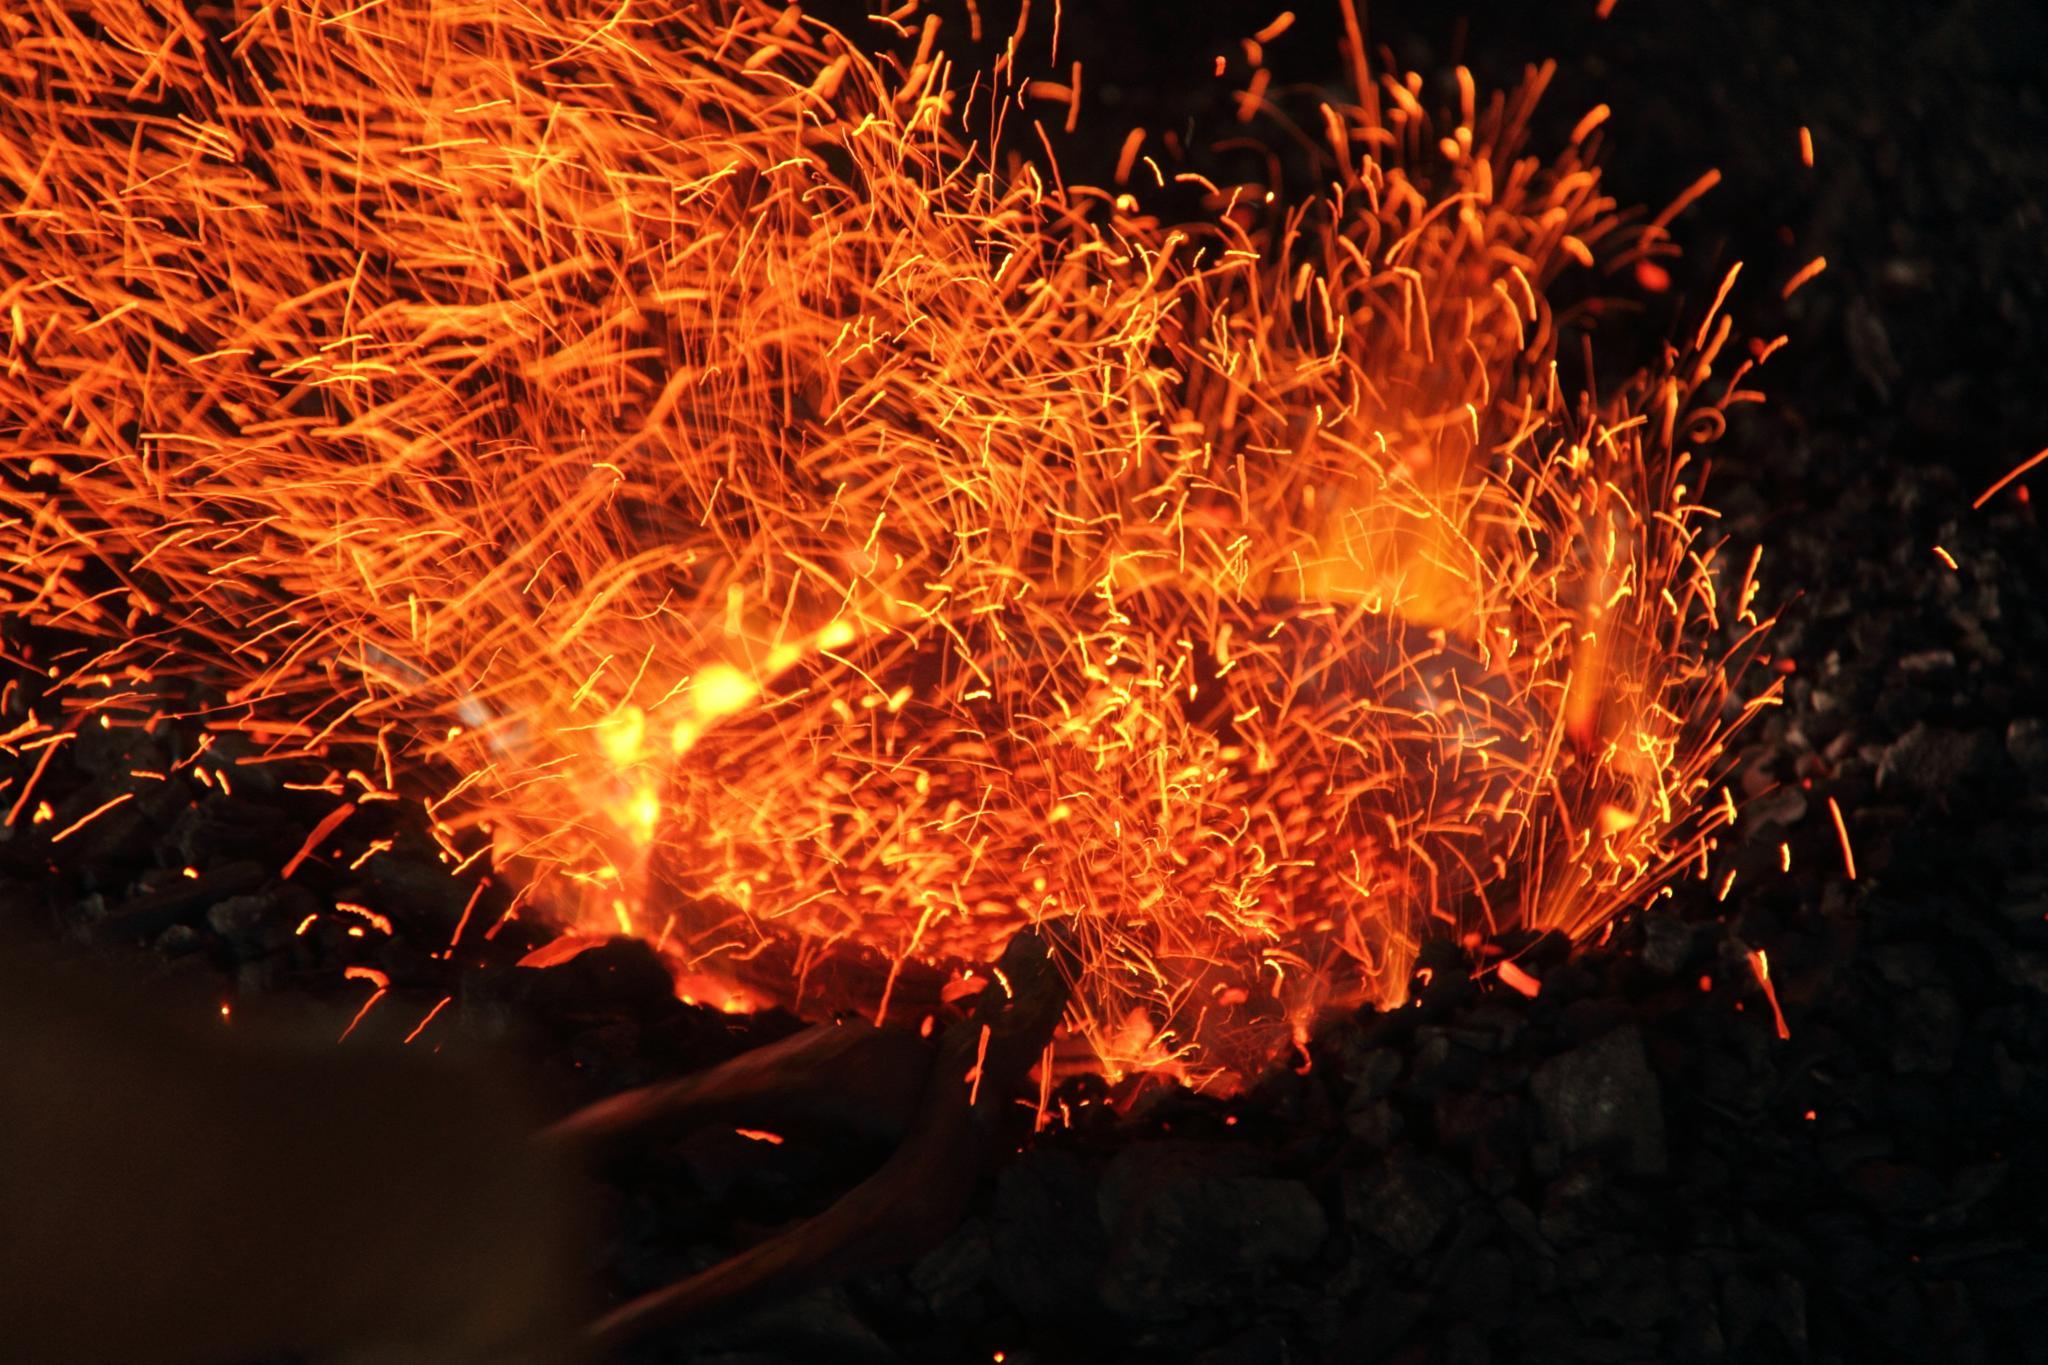 The Split Fire  by sadatbin